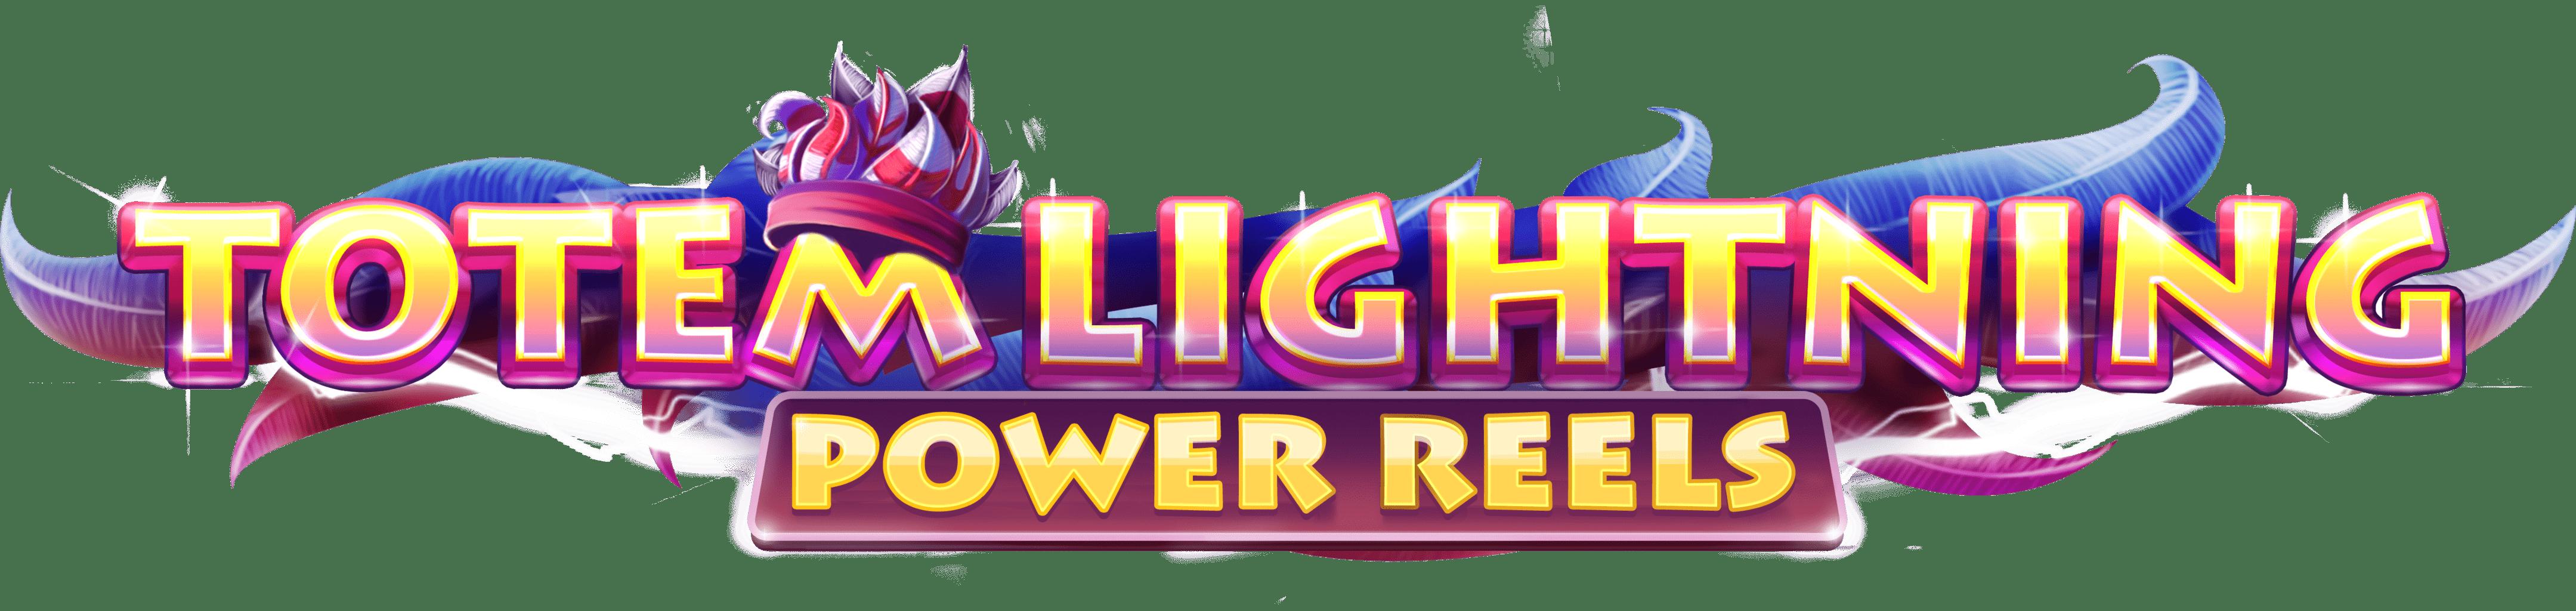 Totem Lightning Power Reels slots mega reel